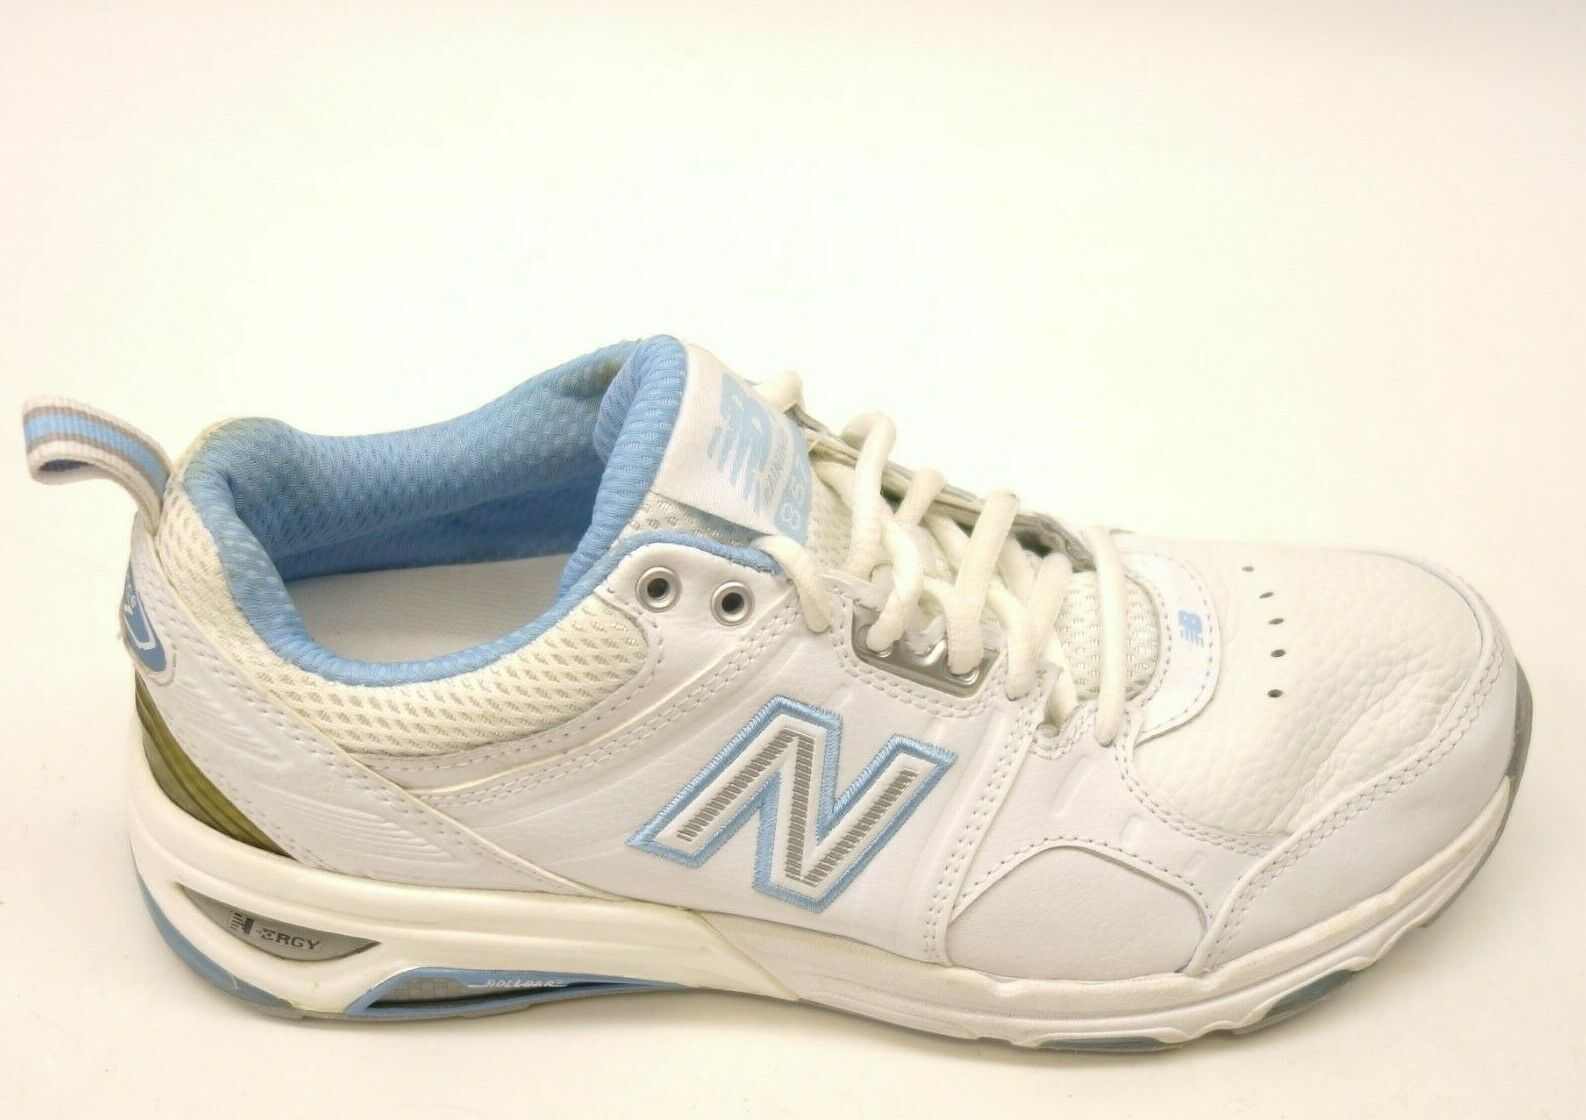 New Balance 857 US 8,5 Eu 40 2a X-Narrow Cuir Blanc Marche Chaussures pour